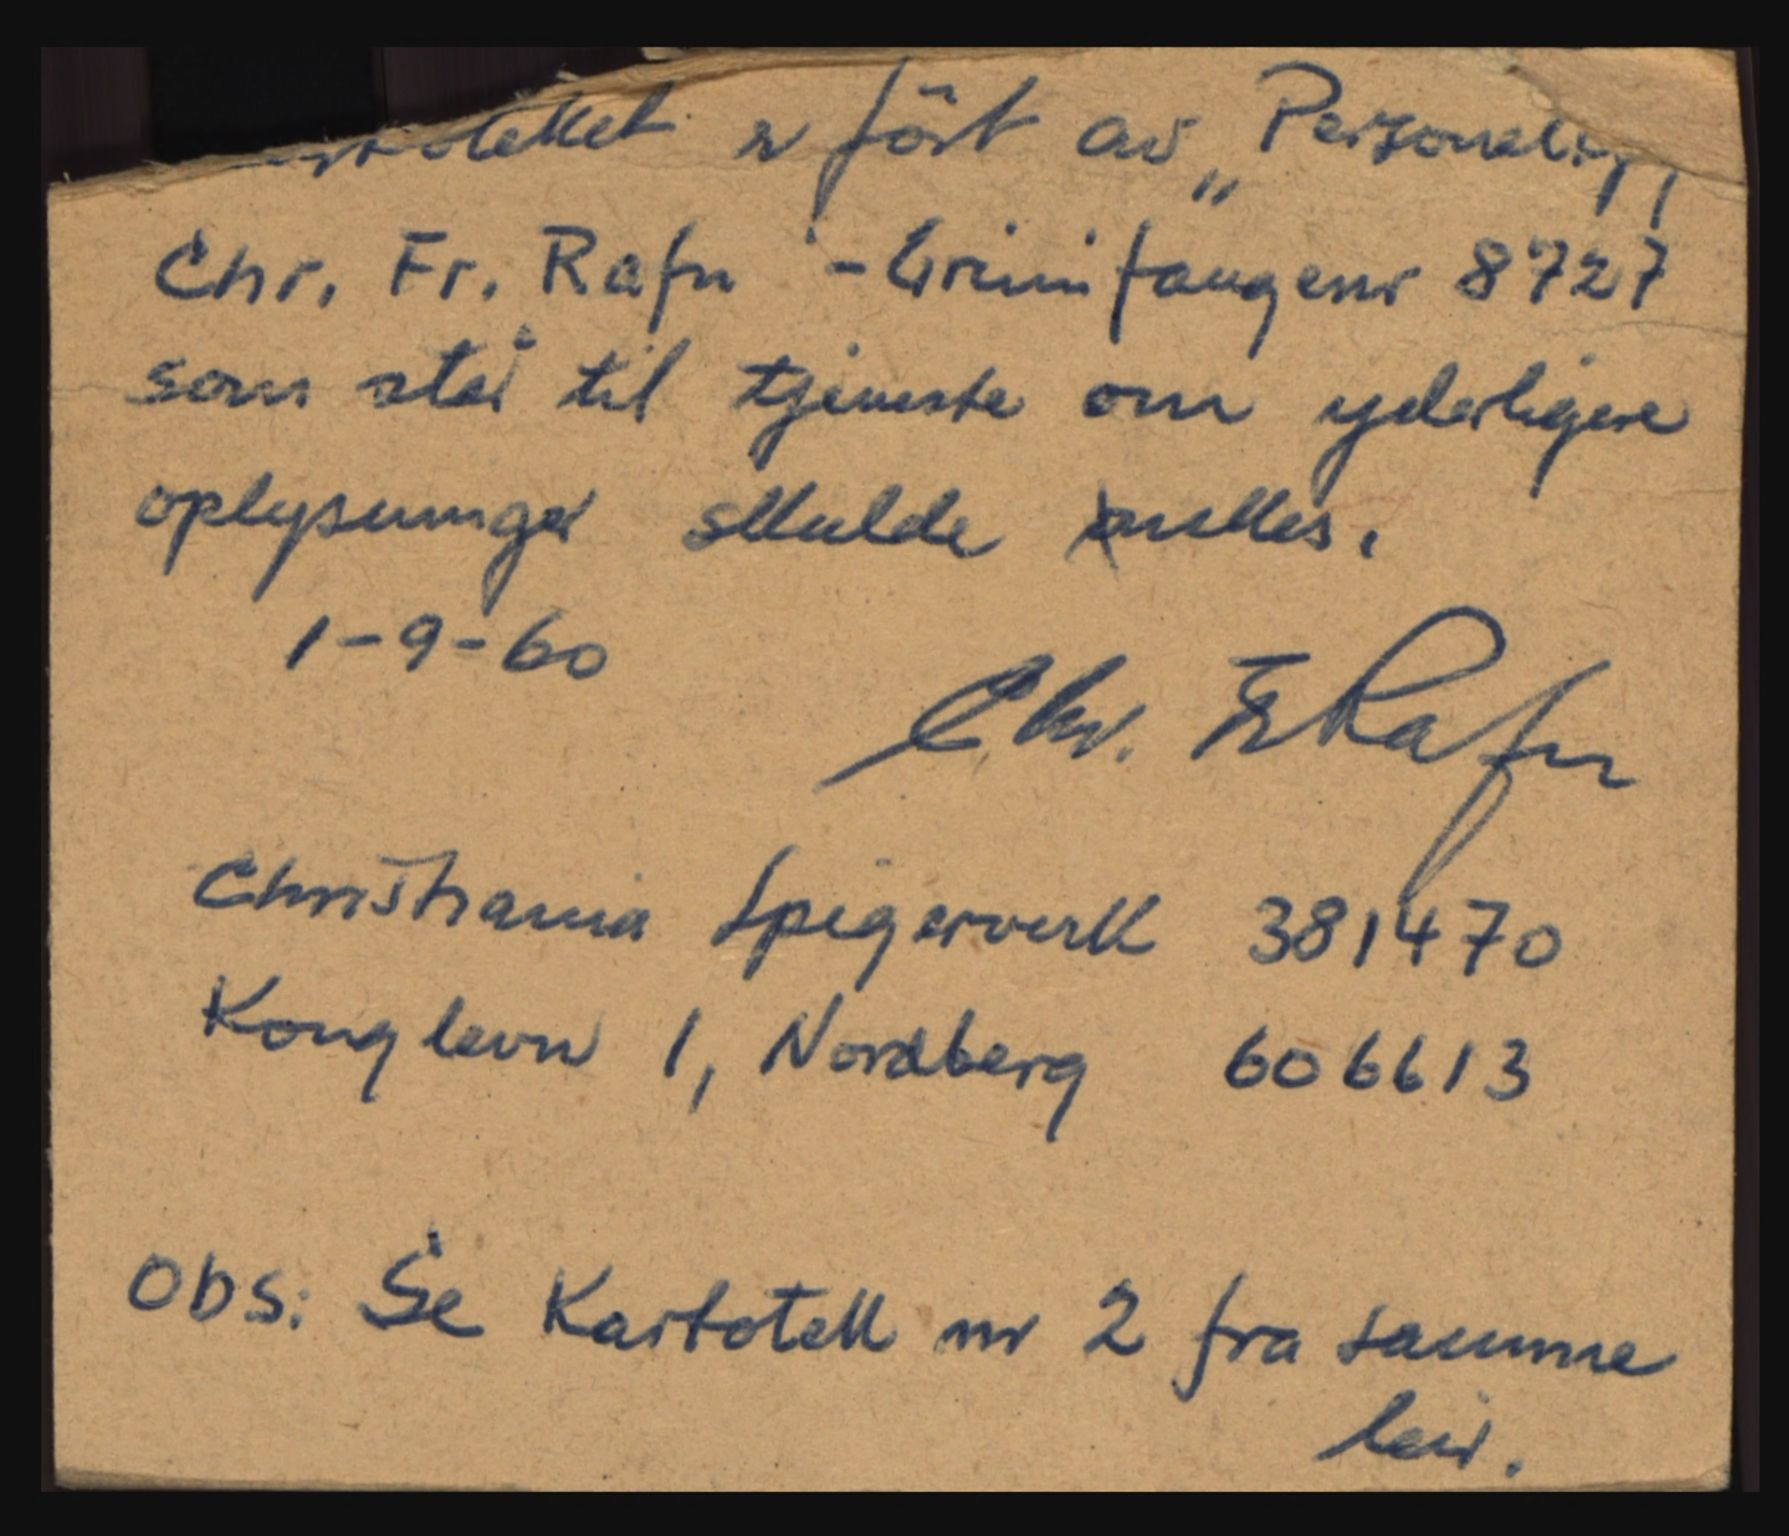 RA, Politiets overvåkningstjeneste, D/Df/L0005: Fangekartotek fra Bardufoss. Fanger overført fra Grini, Falstad og Tromsdalen I, 1944-1945